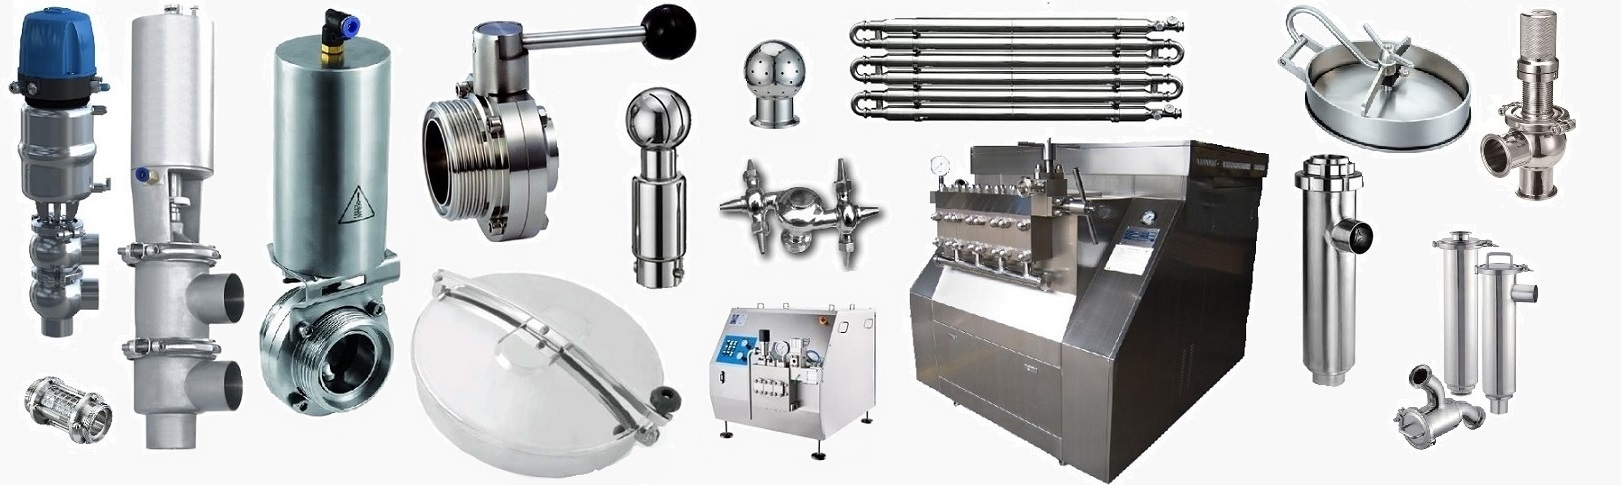 Food_valves_and_homogenizer_2